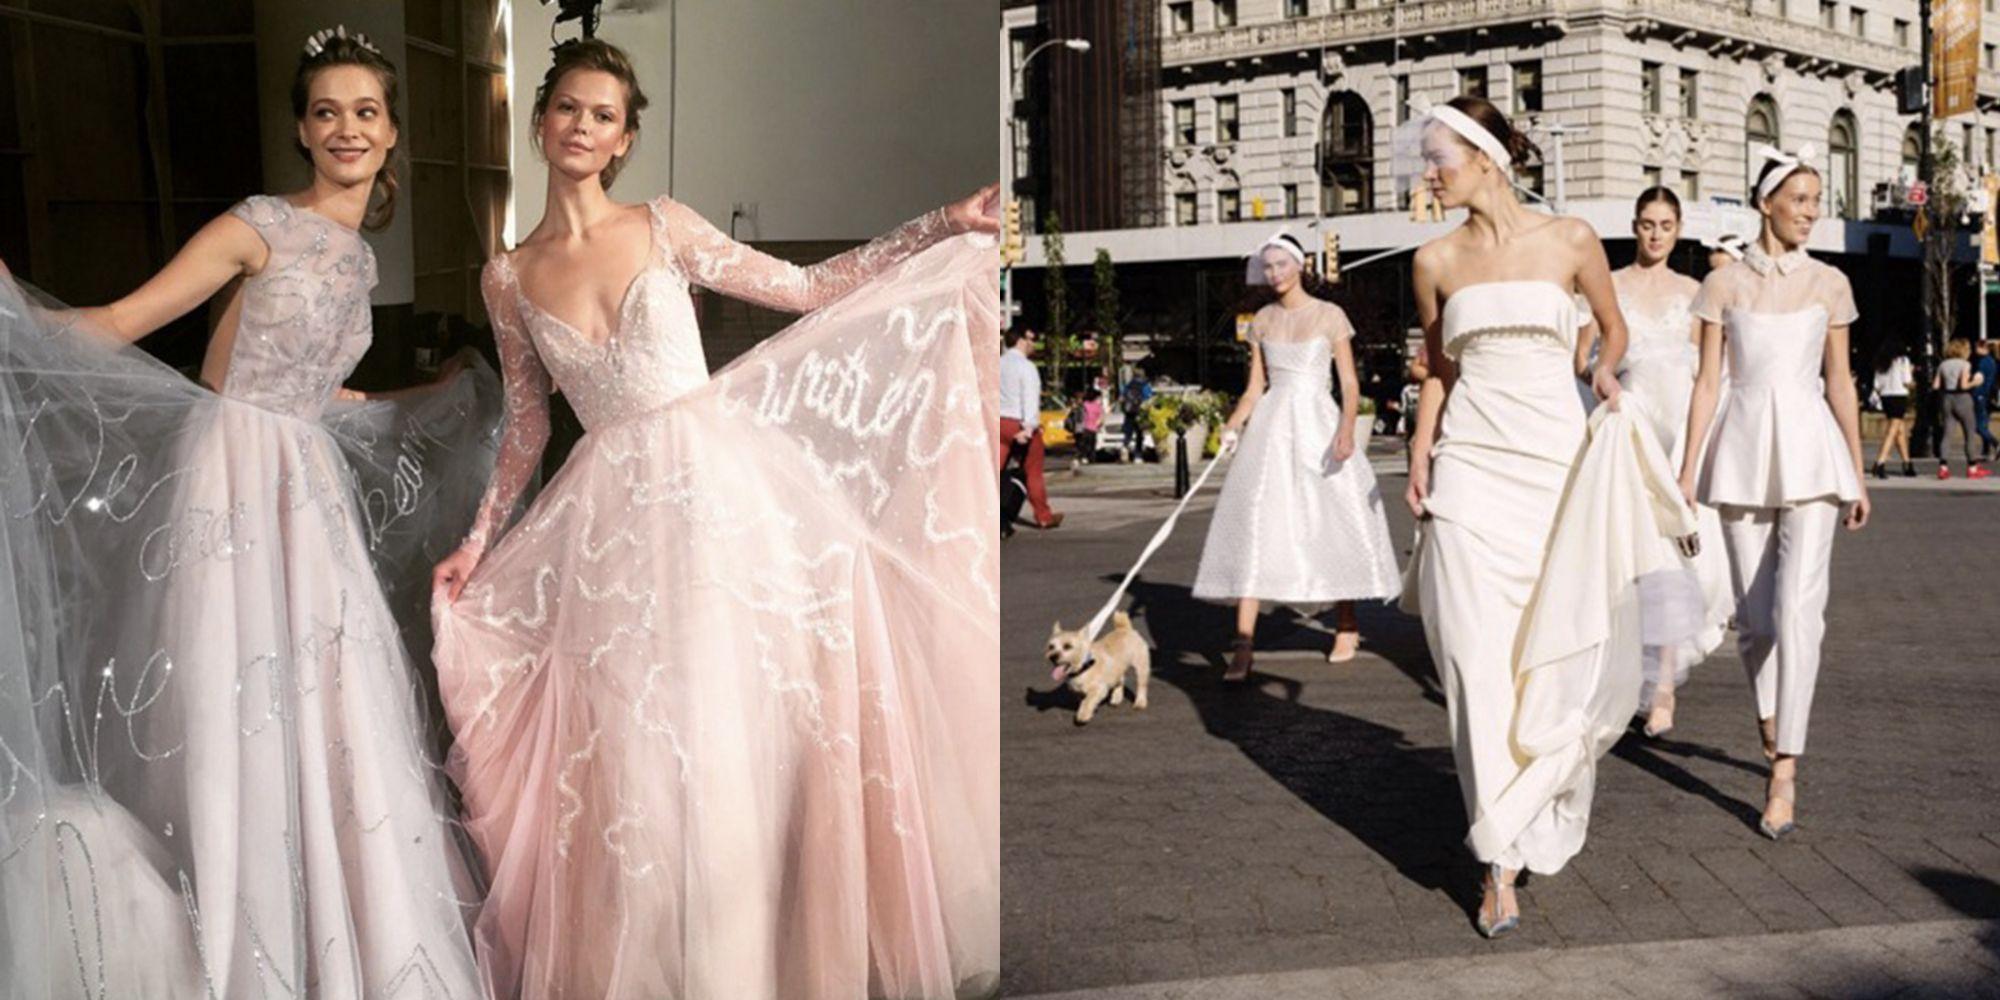 Most Beautiful Brides Dresses